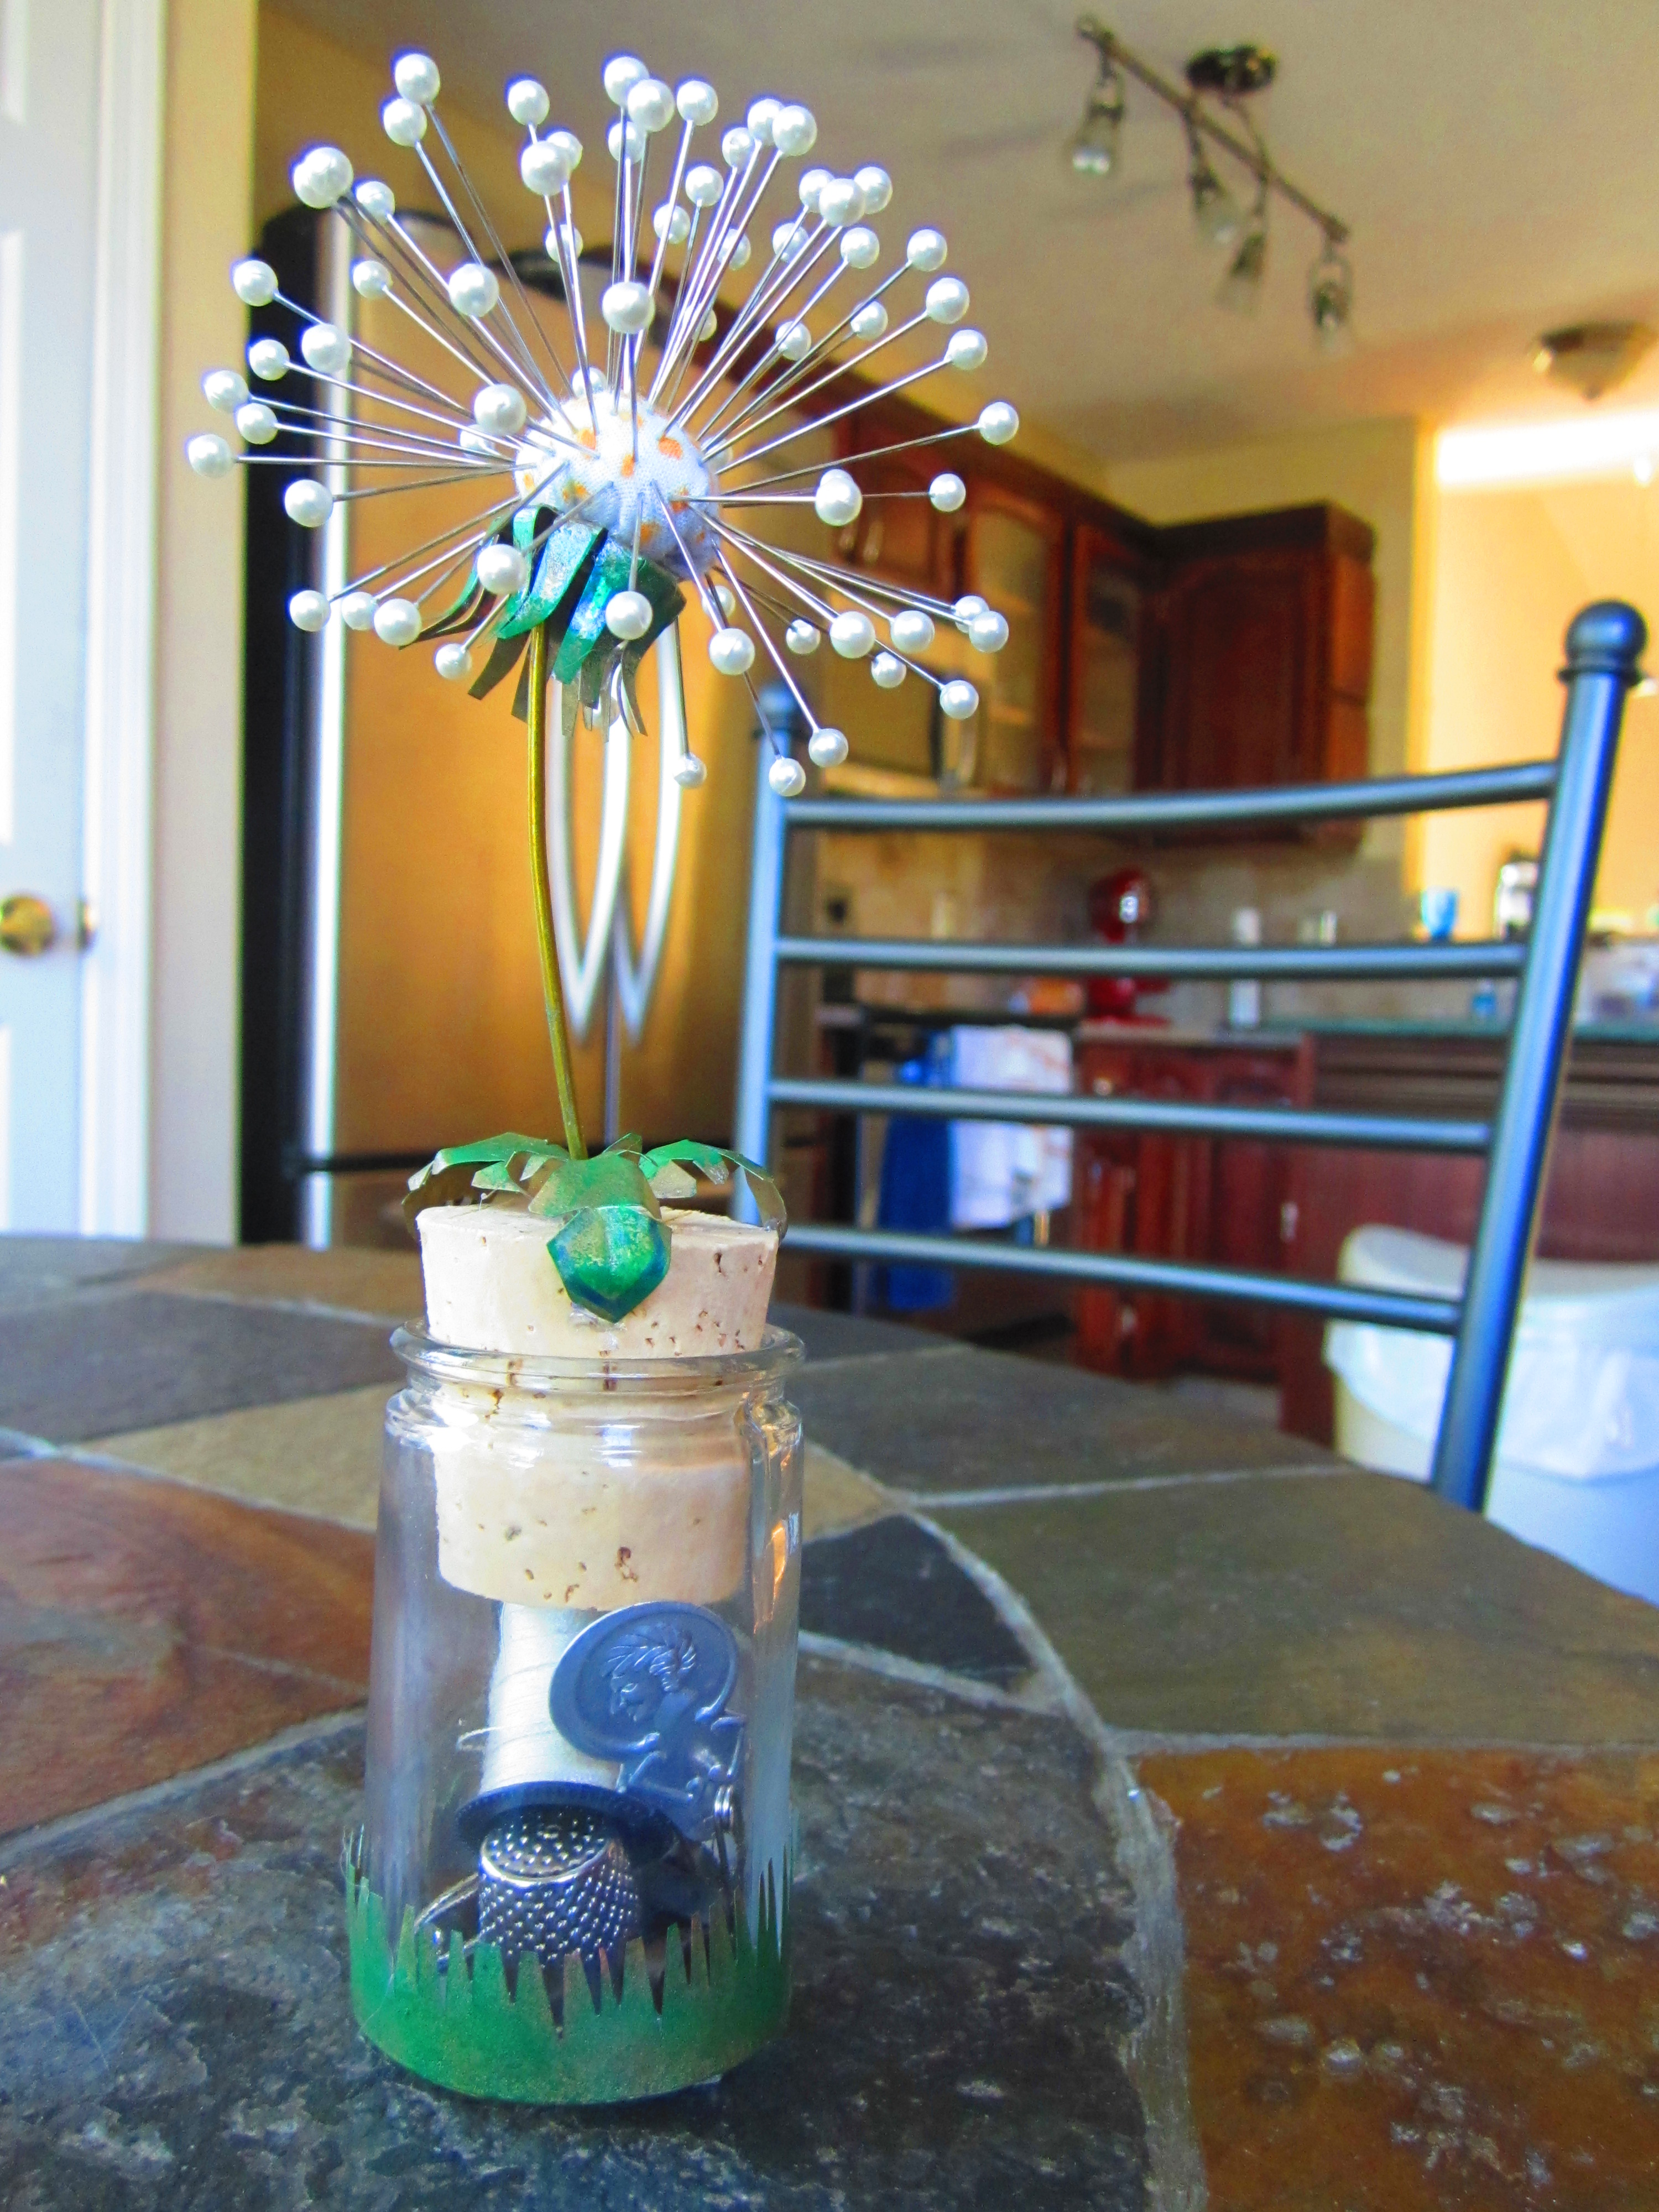 Dandelion Pincushion and mini sewing kit